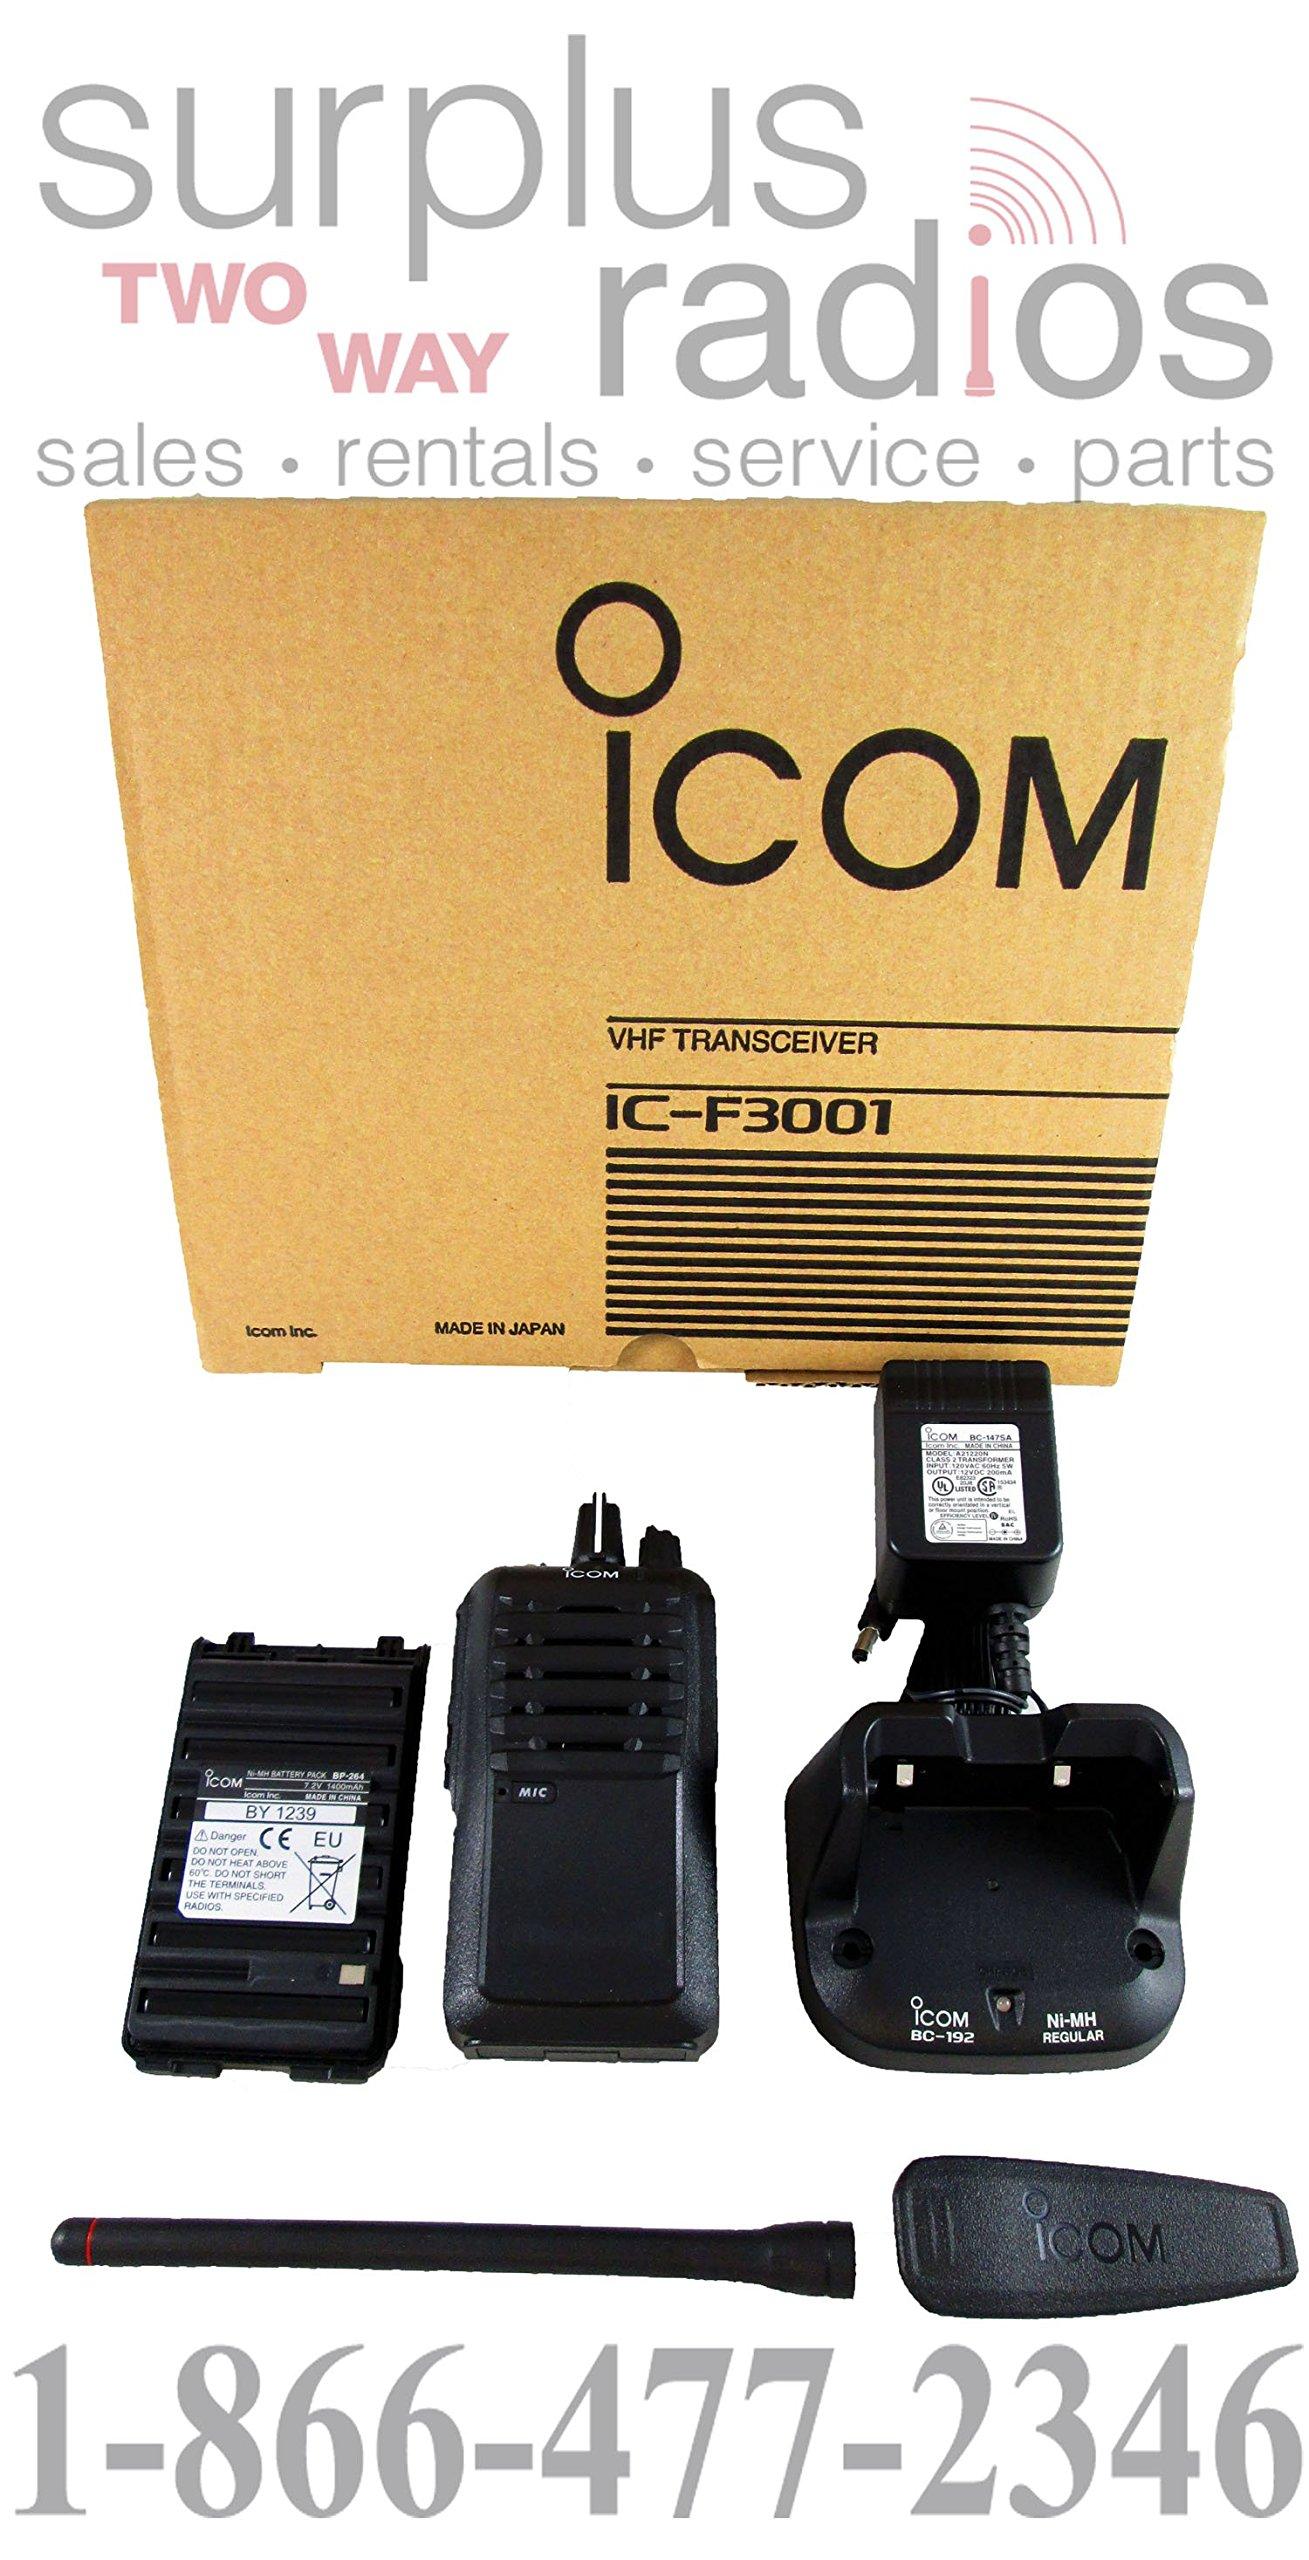 Icom IC-F3001 03 VHF 136-174MHz 5W 16 CHANNELS Two Way Radio